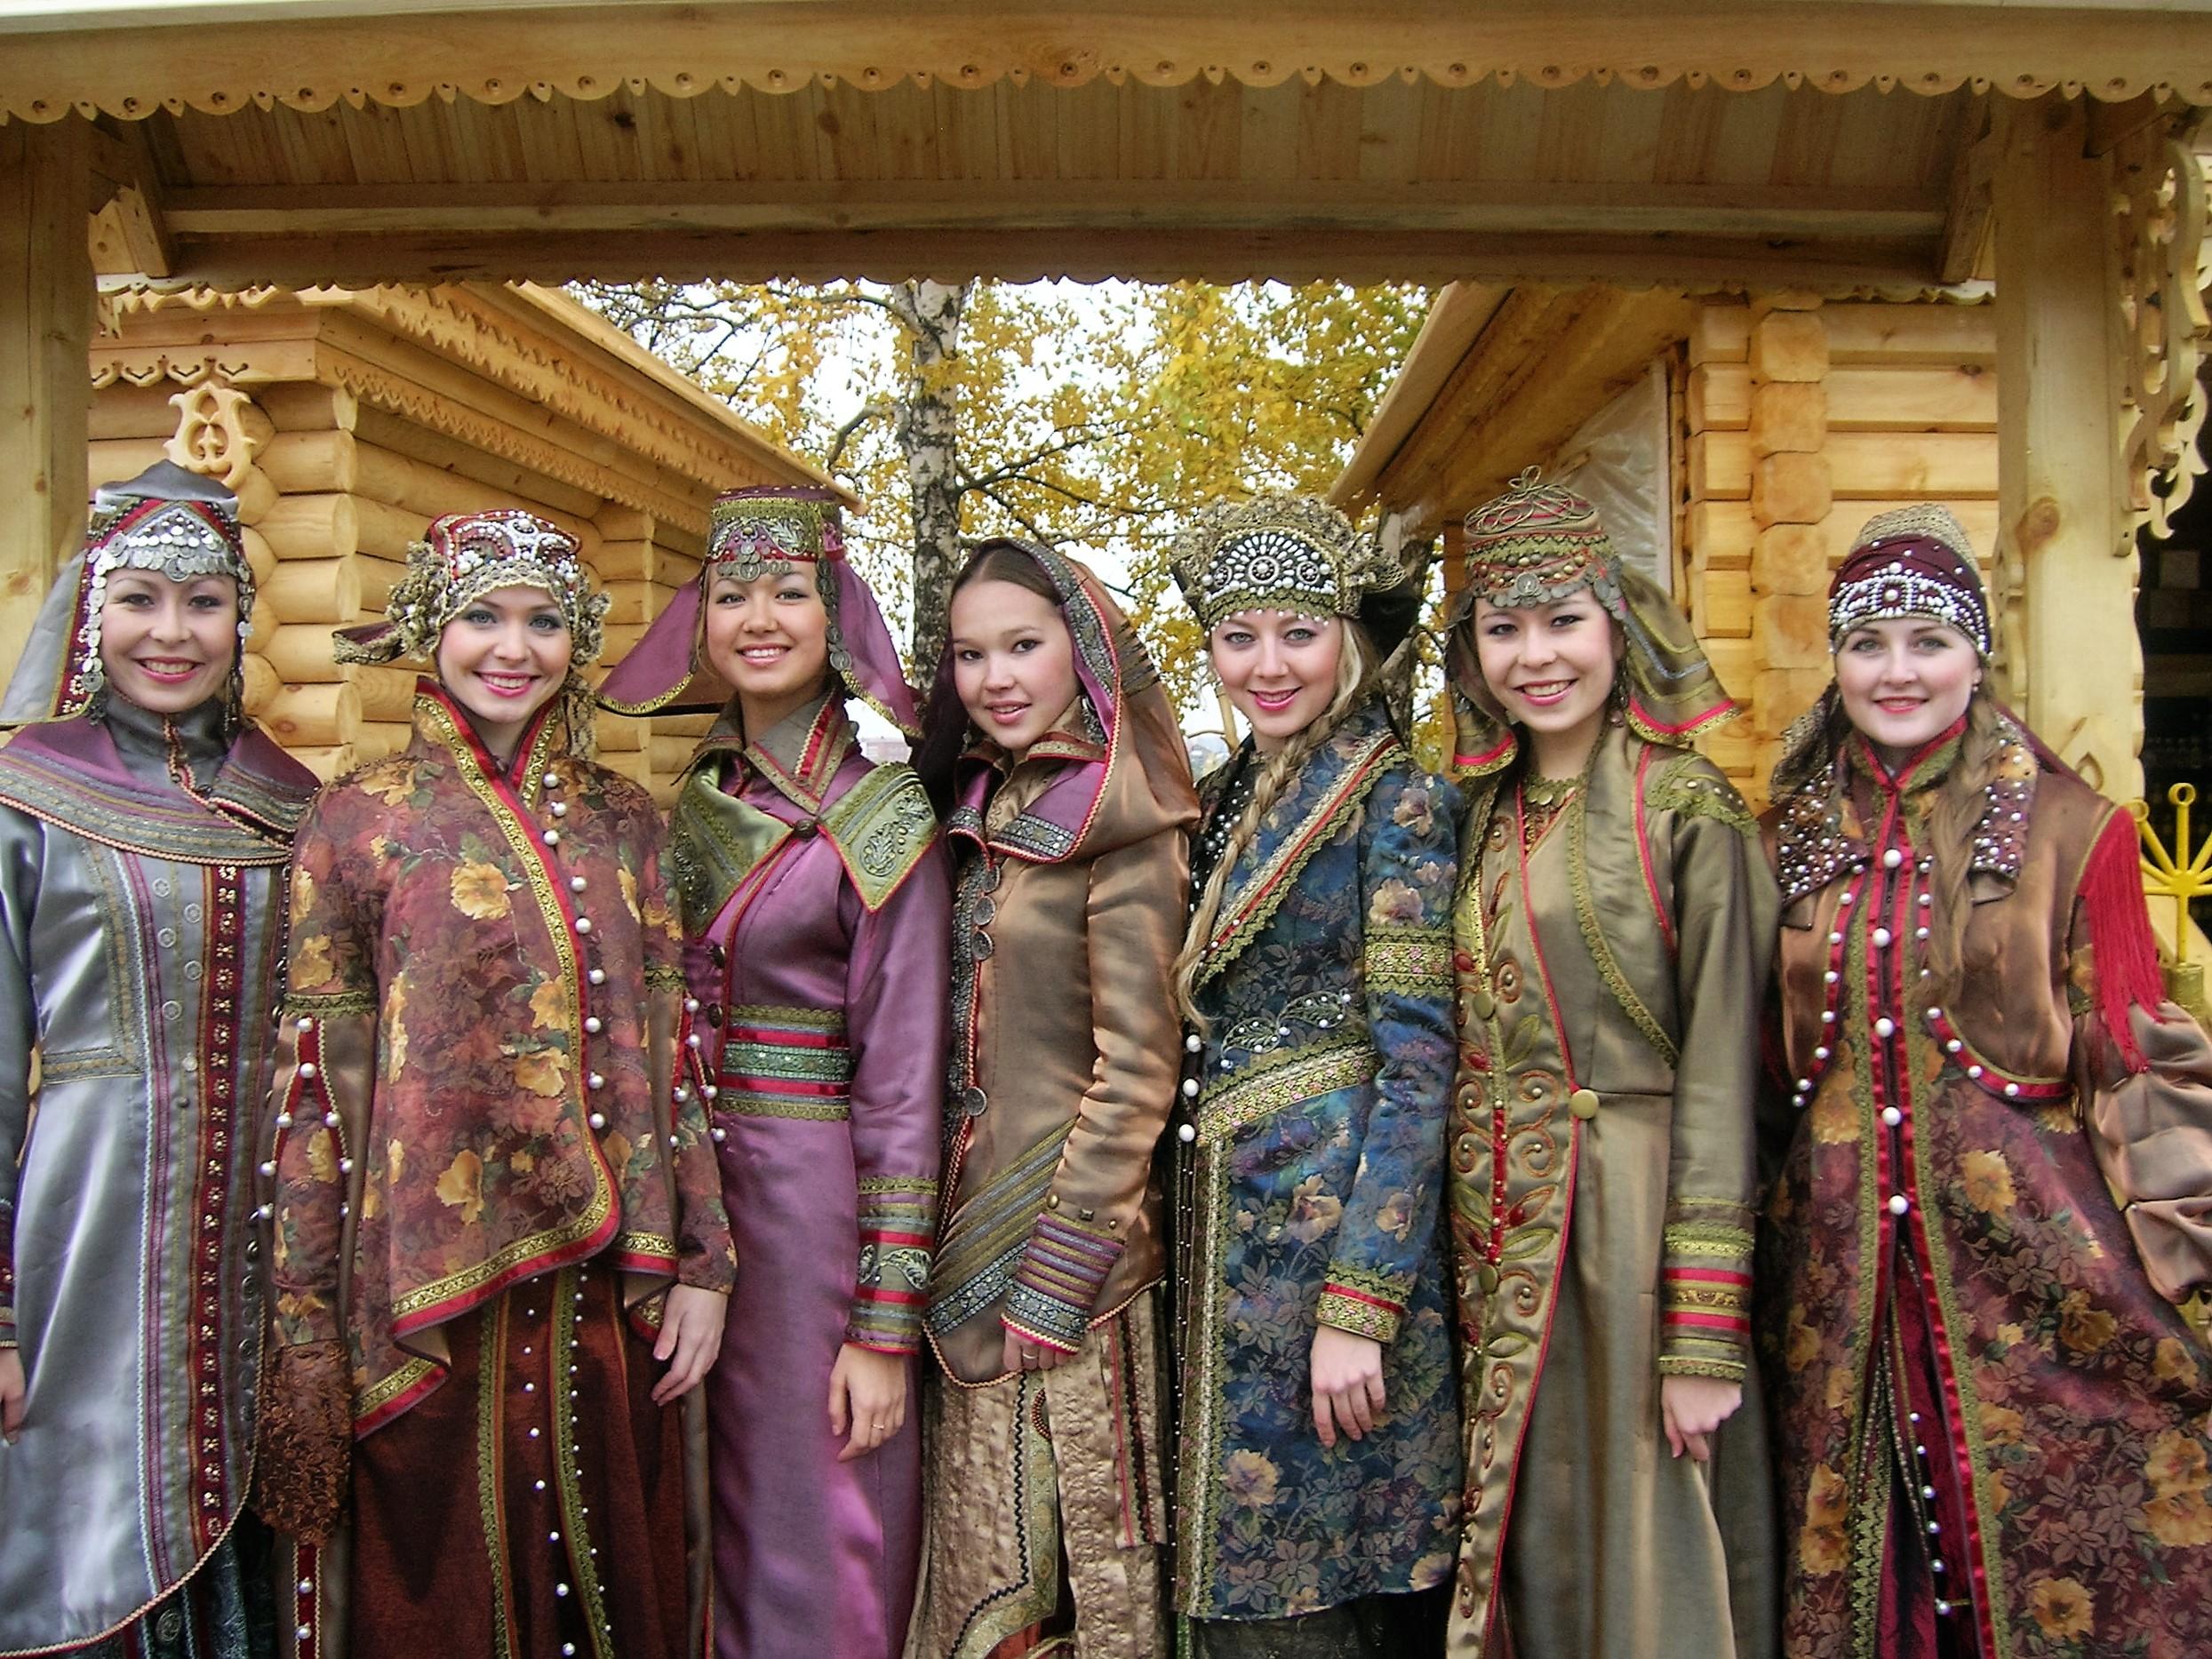 башкирская одежда, Кидяркин модельер